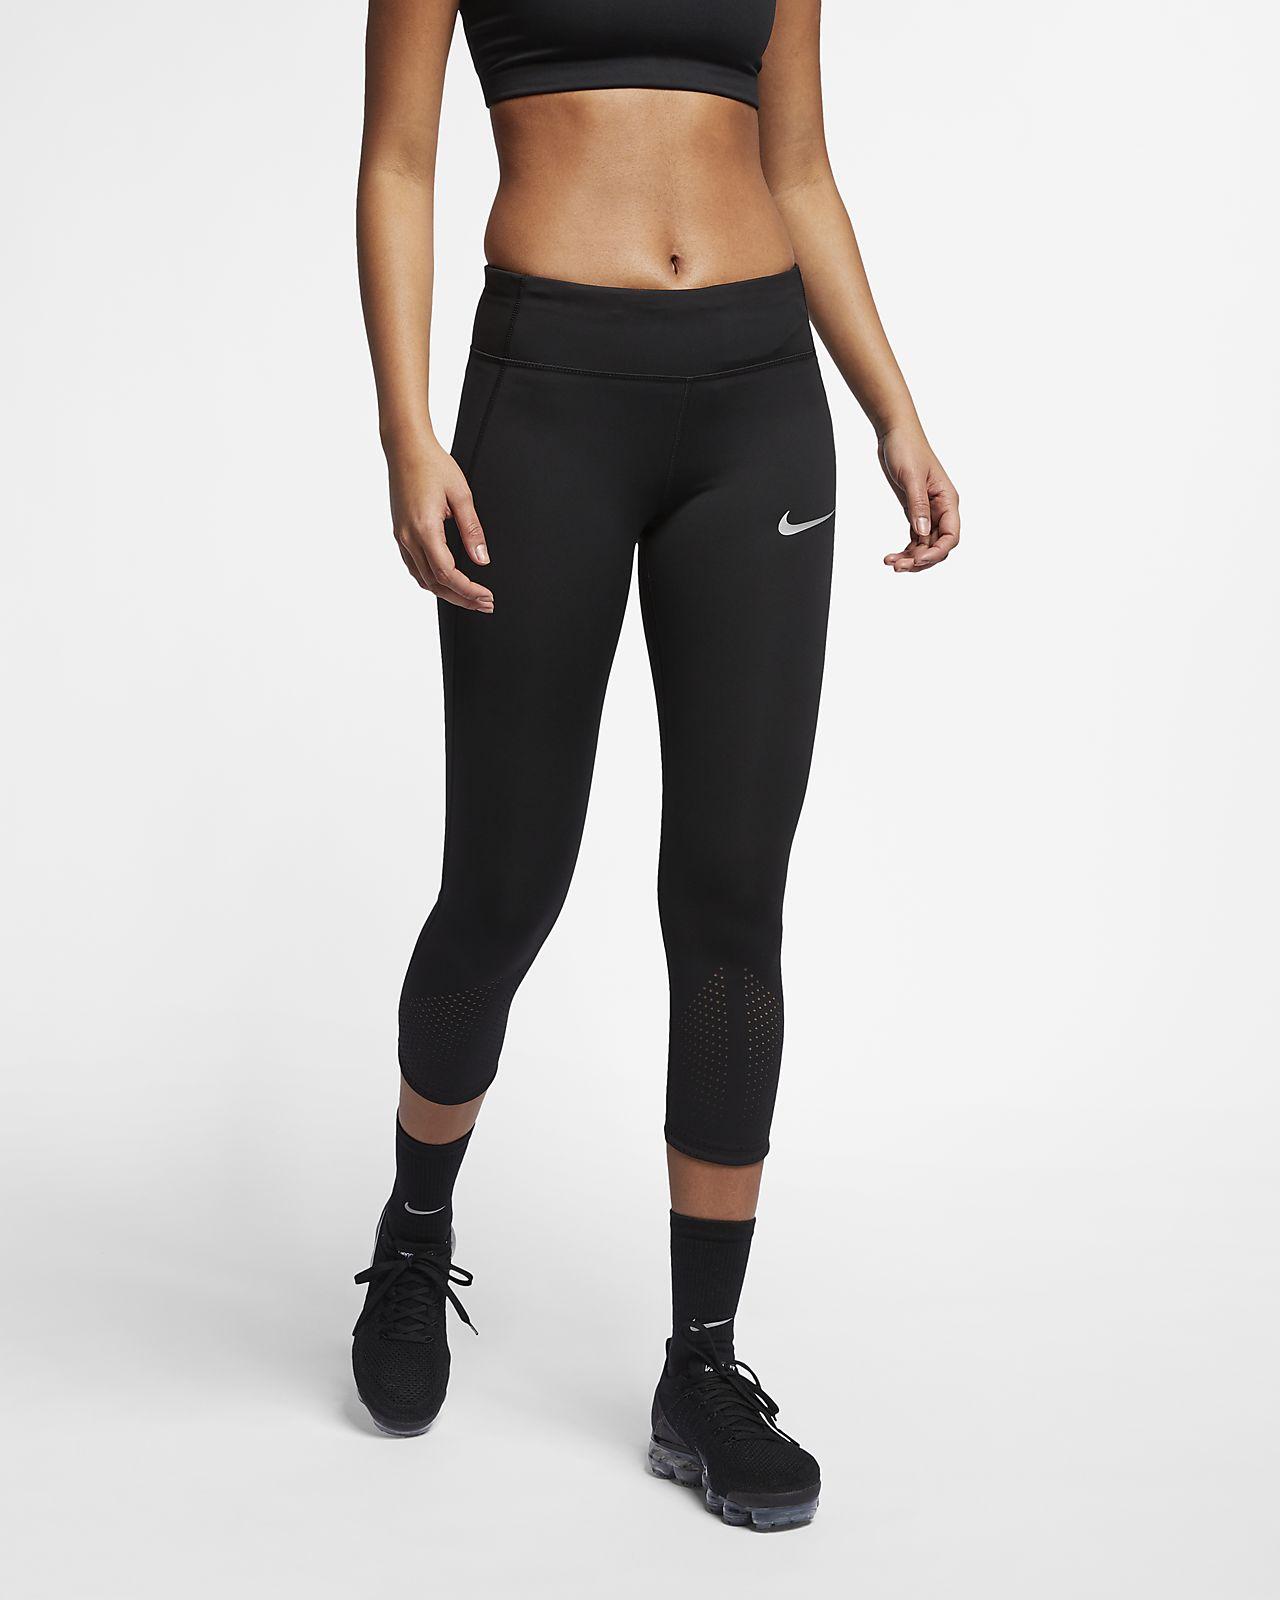 Nike Epic Lux Women's Running Capris